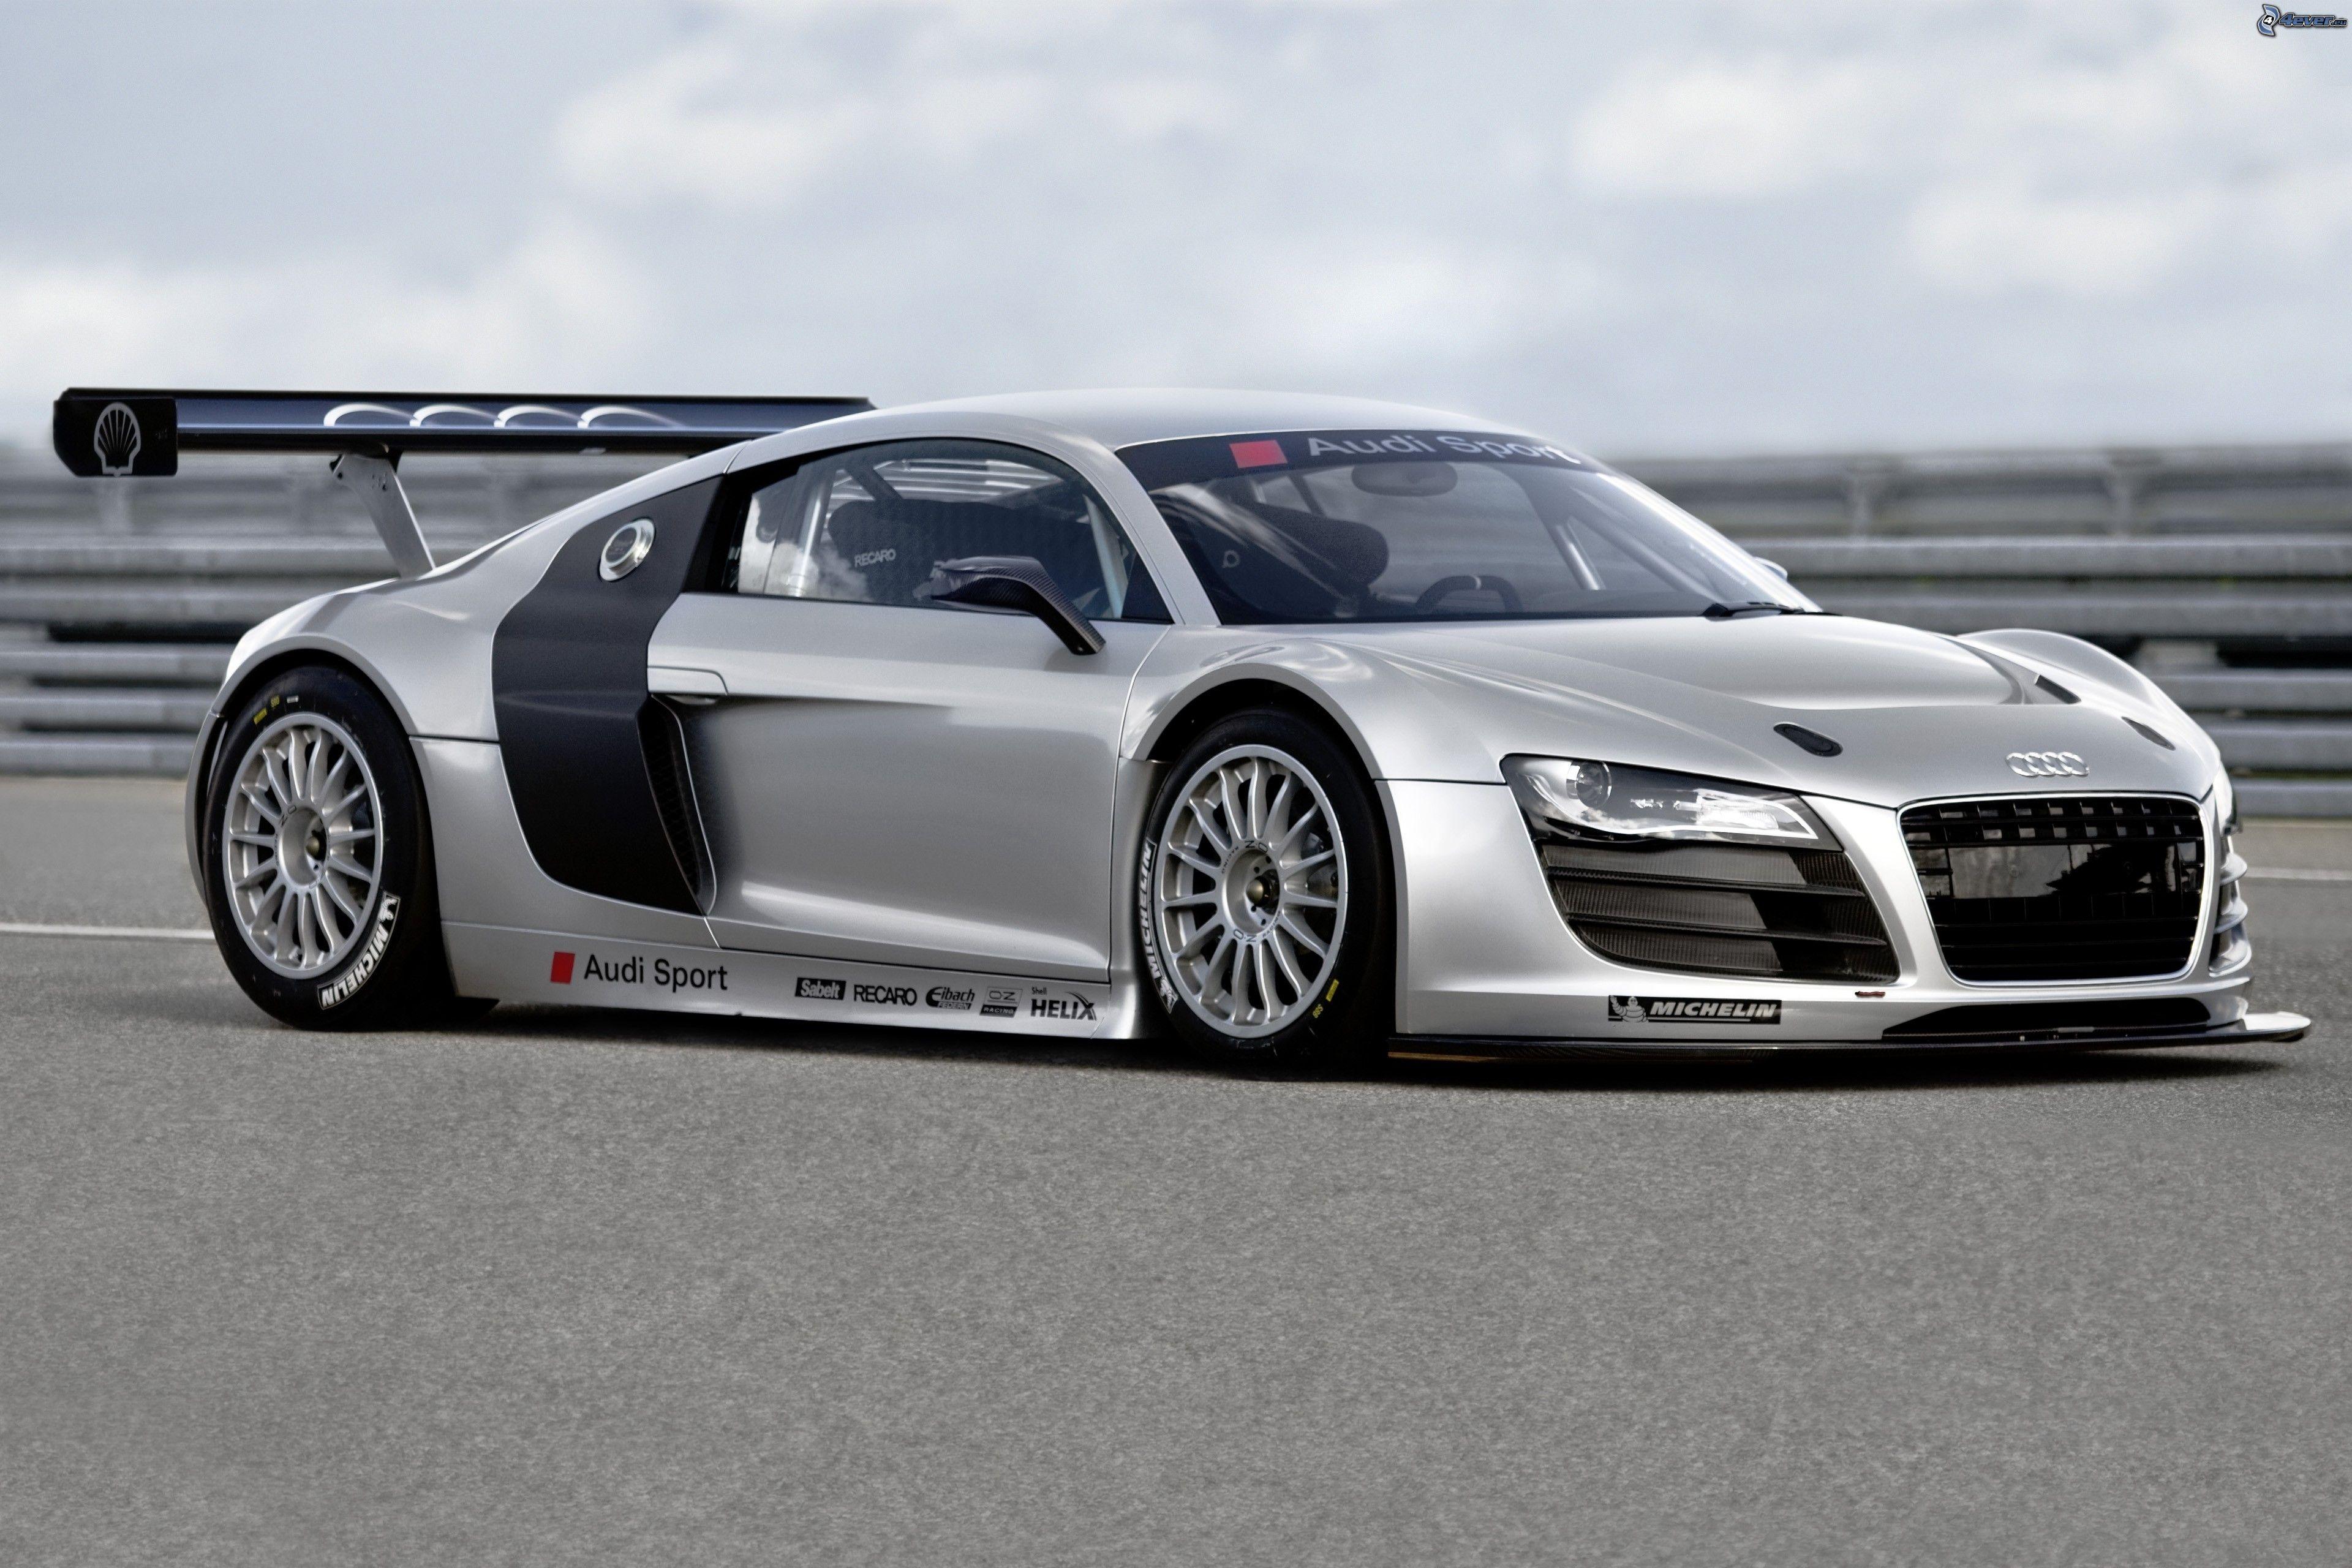 Kelebihan Audi Gtr Murah Berkualitas